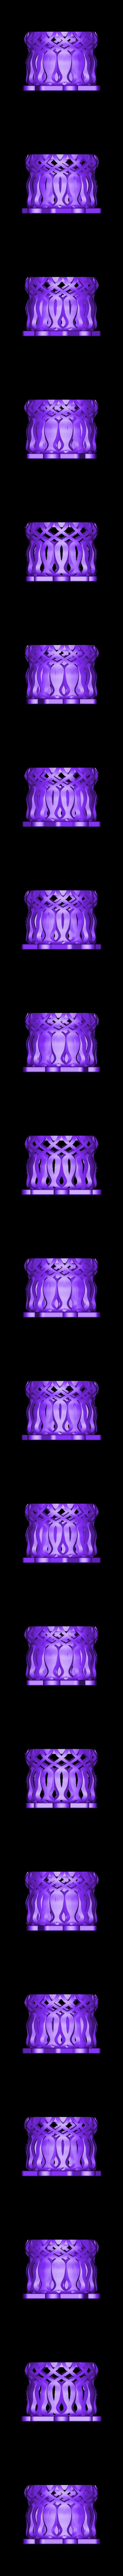 Tea_Time_Candle_Shade_v0 (1).stl Download STL file Tea Time Candle Romantic Light Shade • 3D printing model, alishanmao